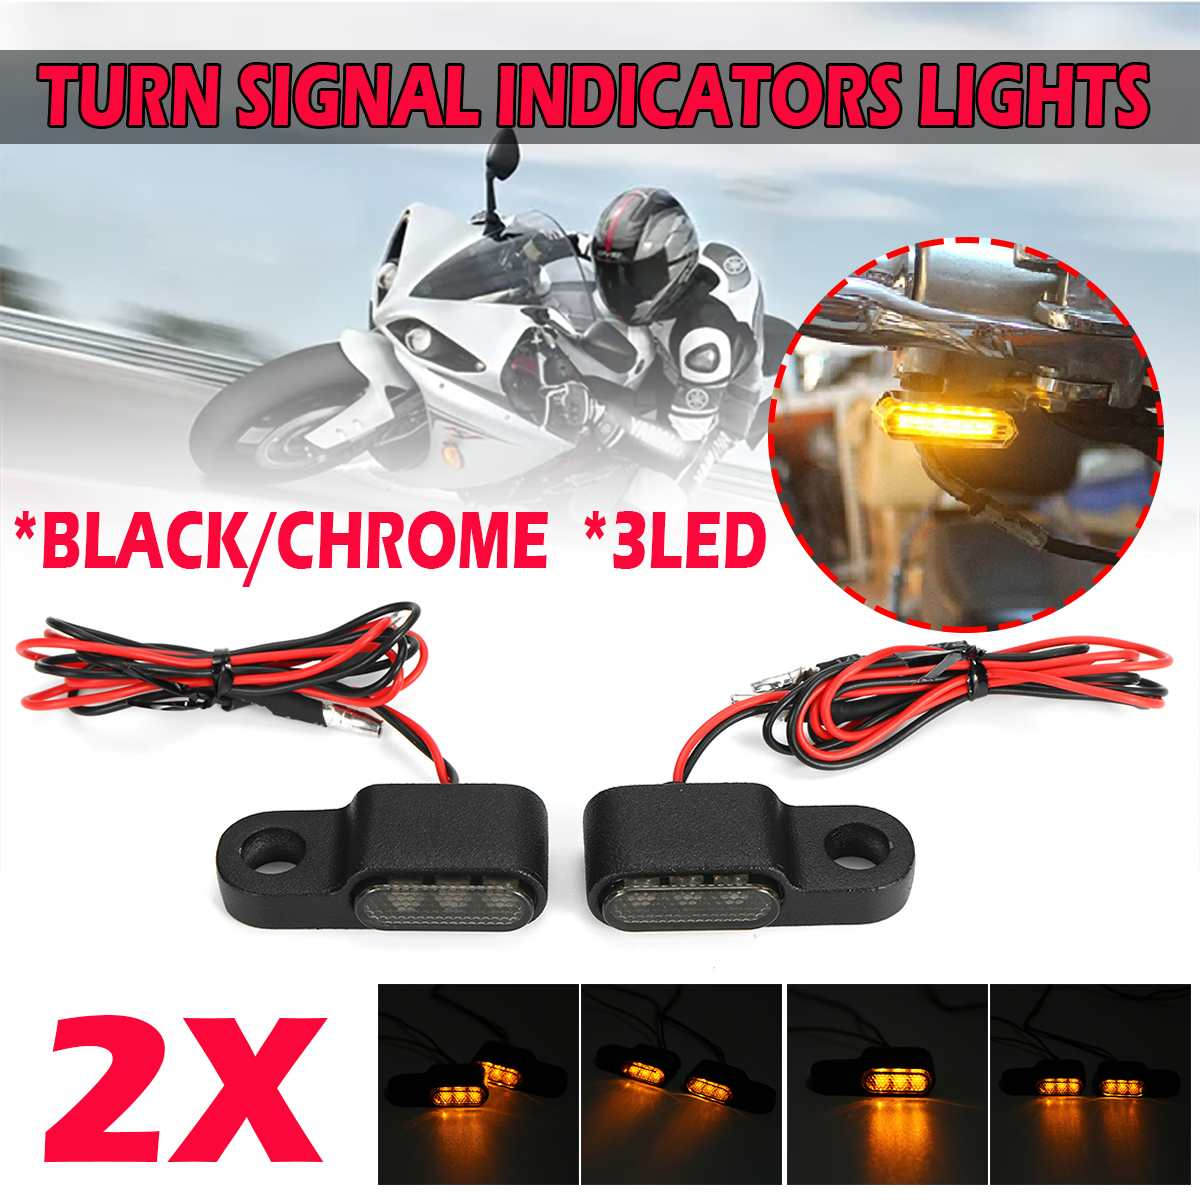 2PCS 12V Amber signal lamp Motorcycle Indicators LED Turn Signal Light Handlebar Blinker Aluminum Alloy Black Chorme